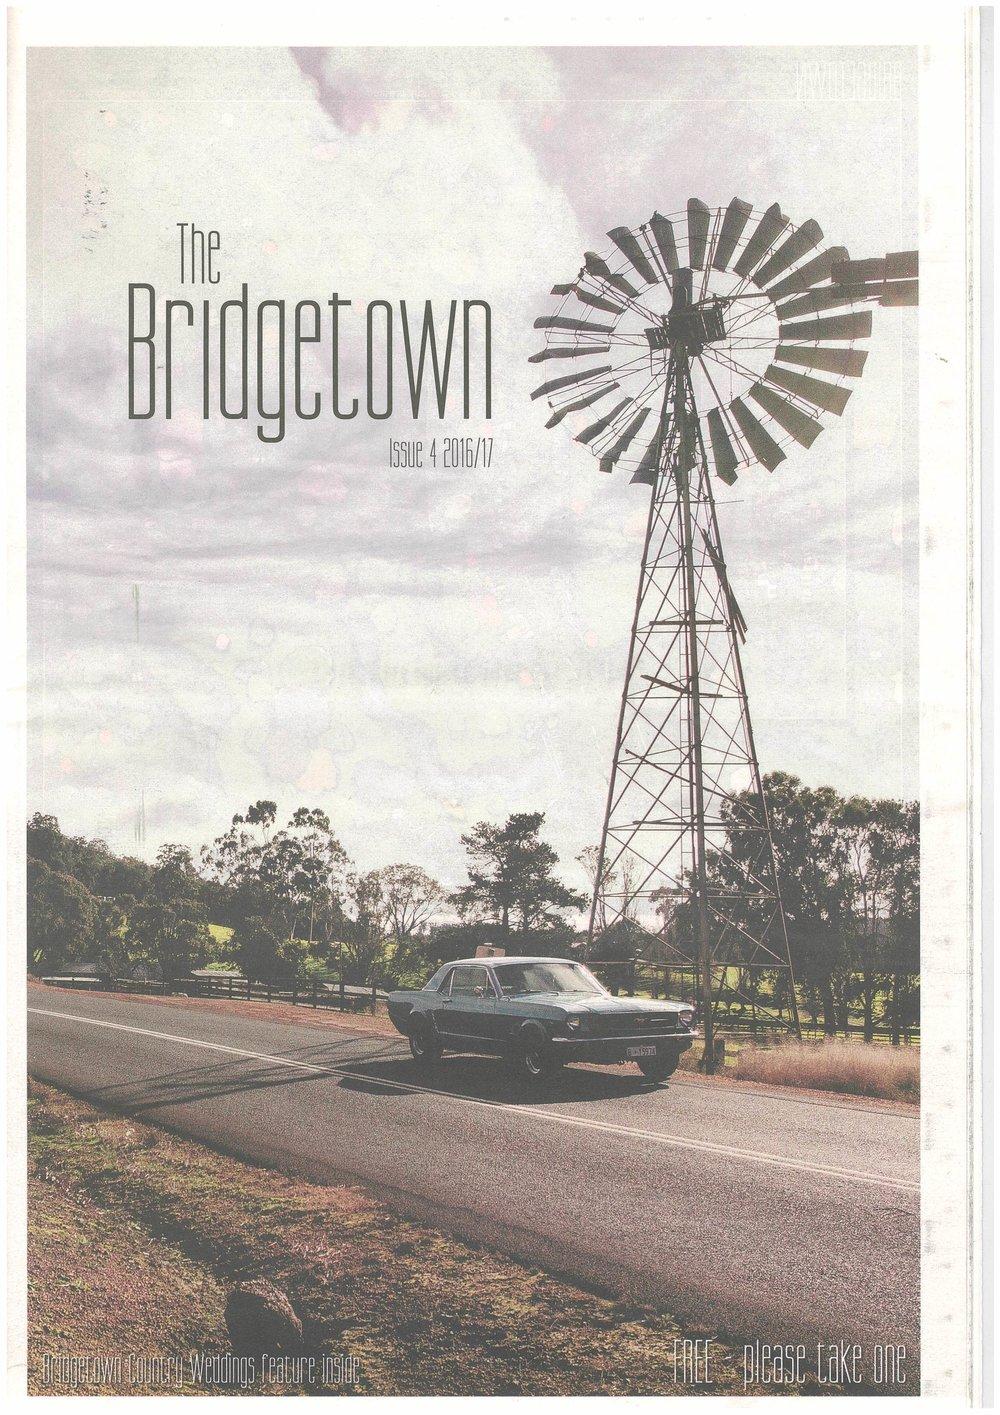 The Bridgetown Paper | Issue 4 2016/17